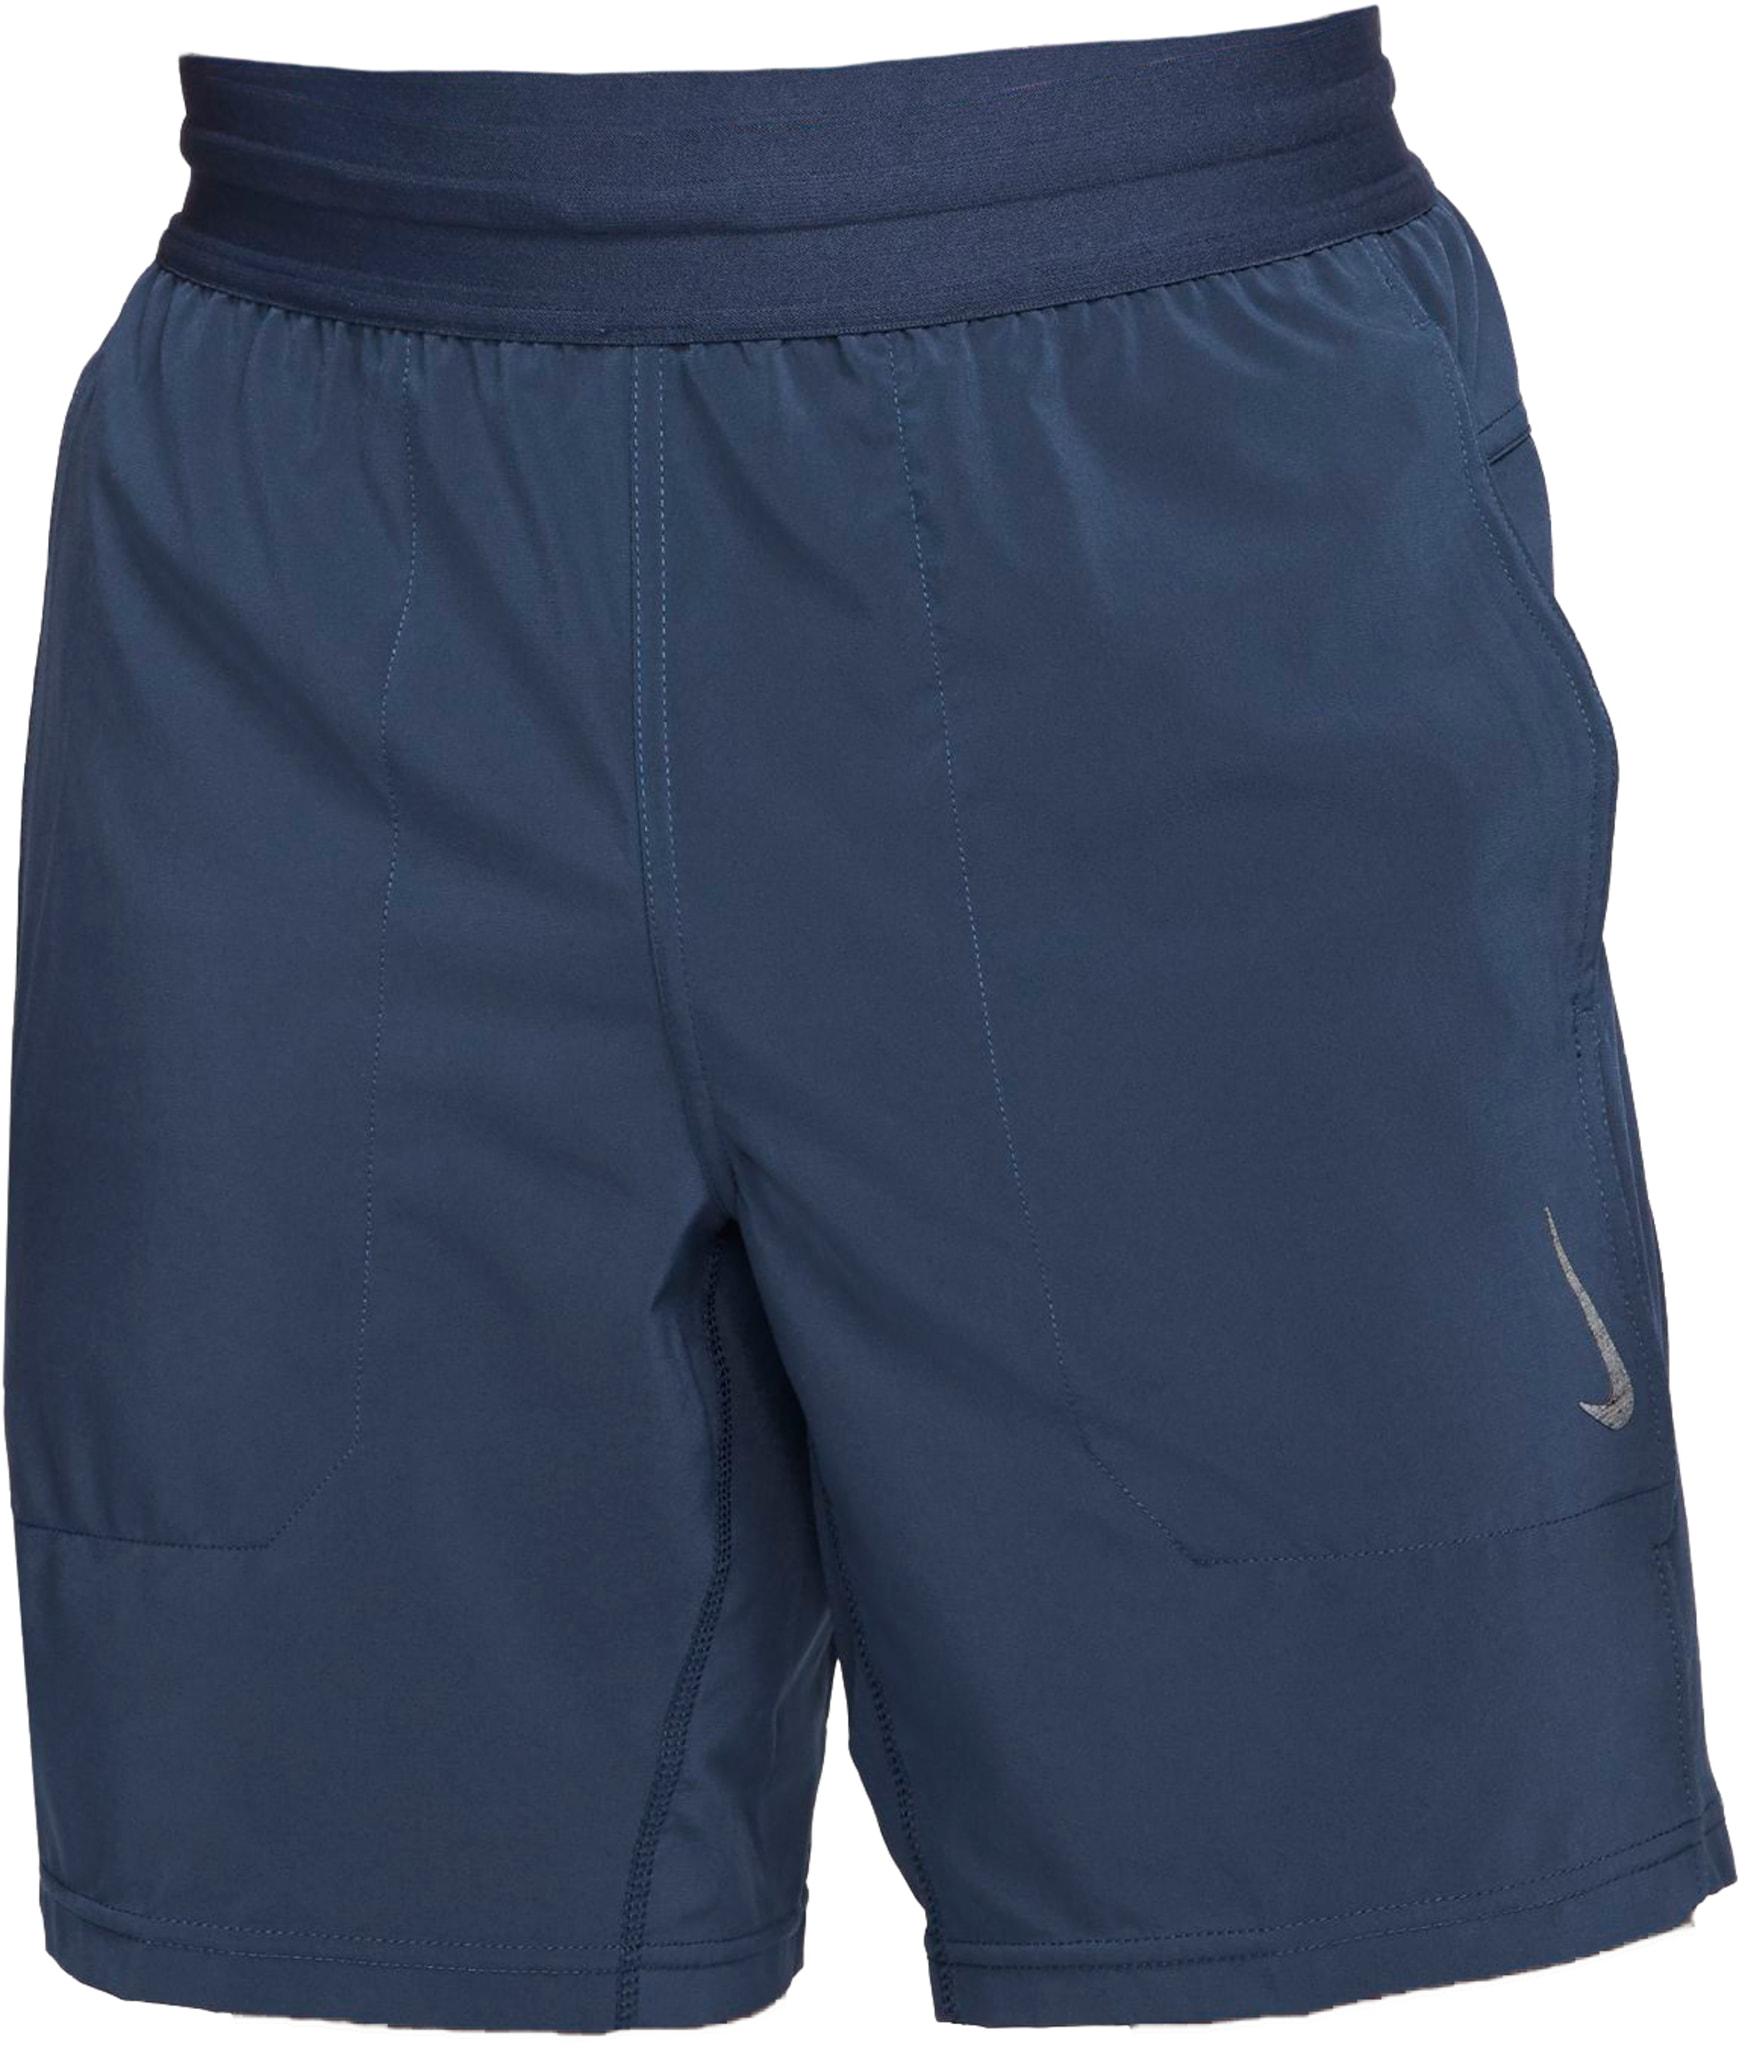 Yoga Shorts M